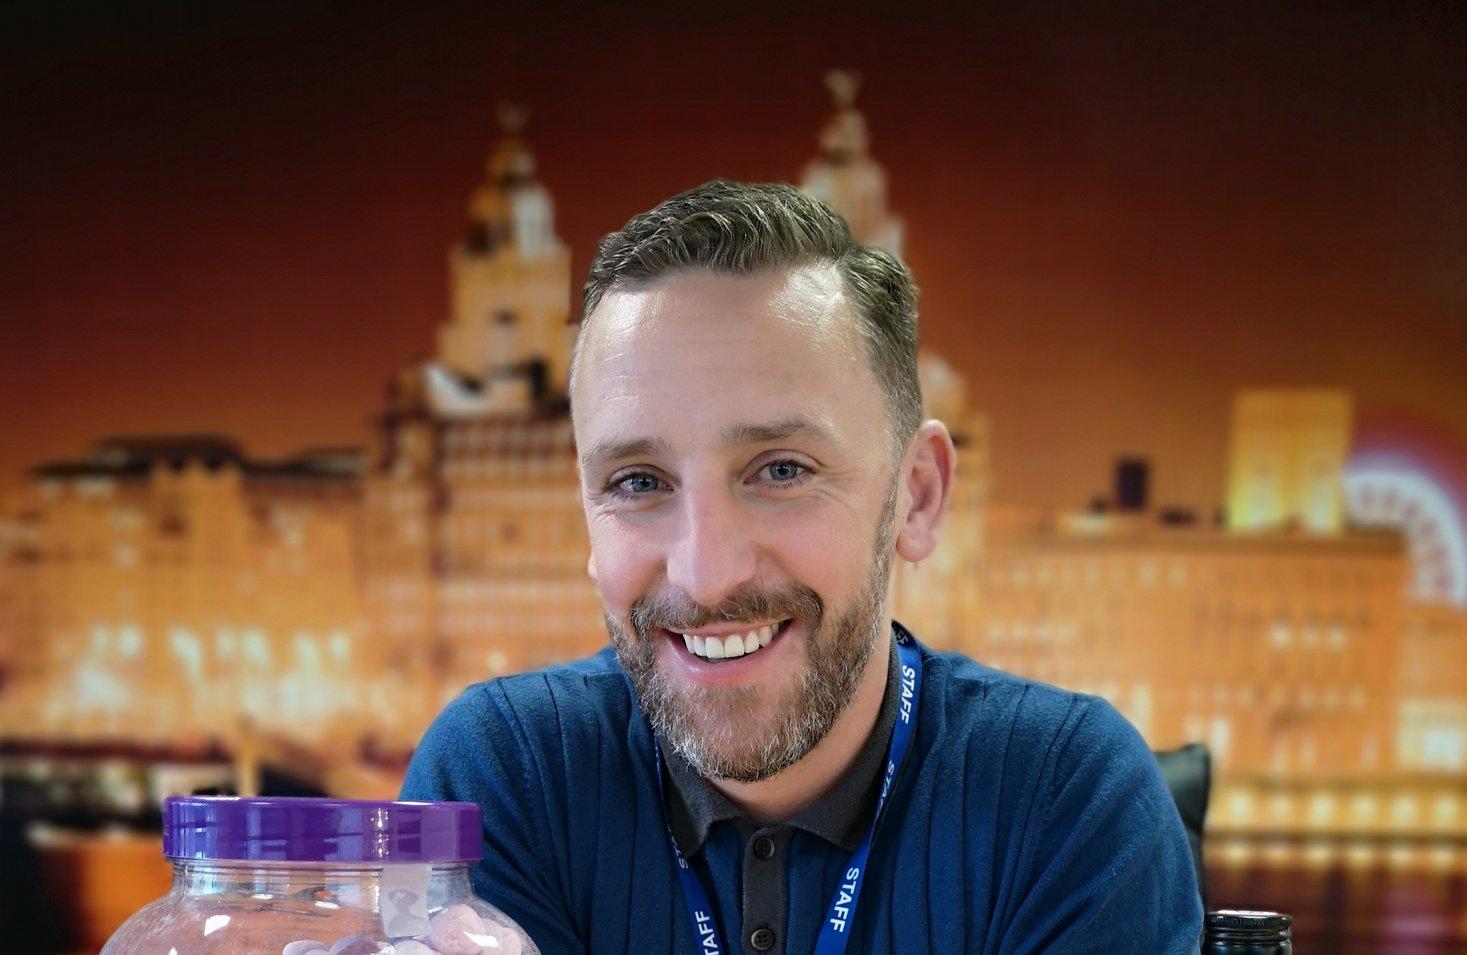 Michael Rowark, Blends operations director